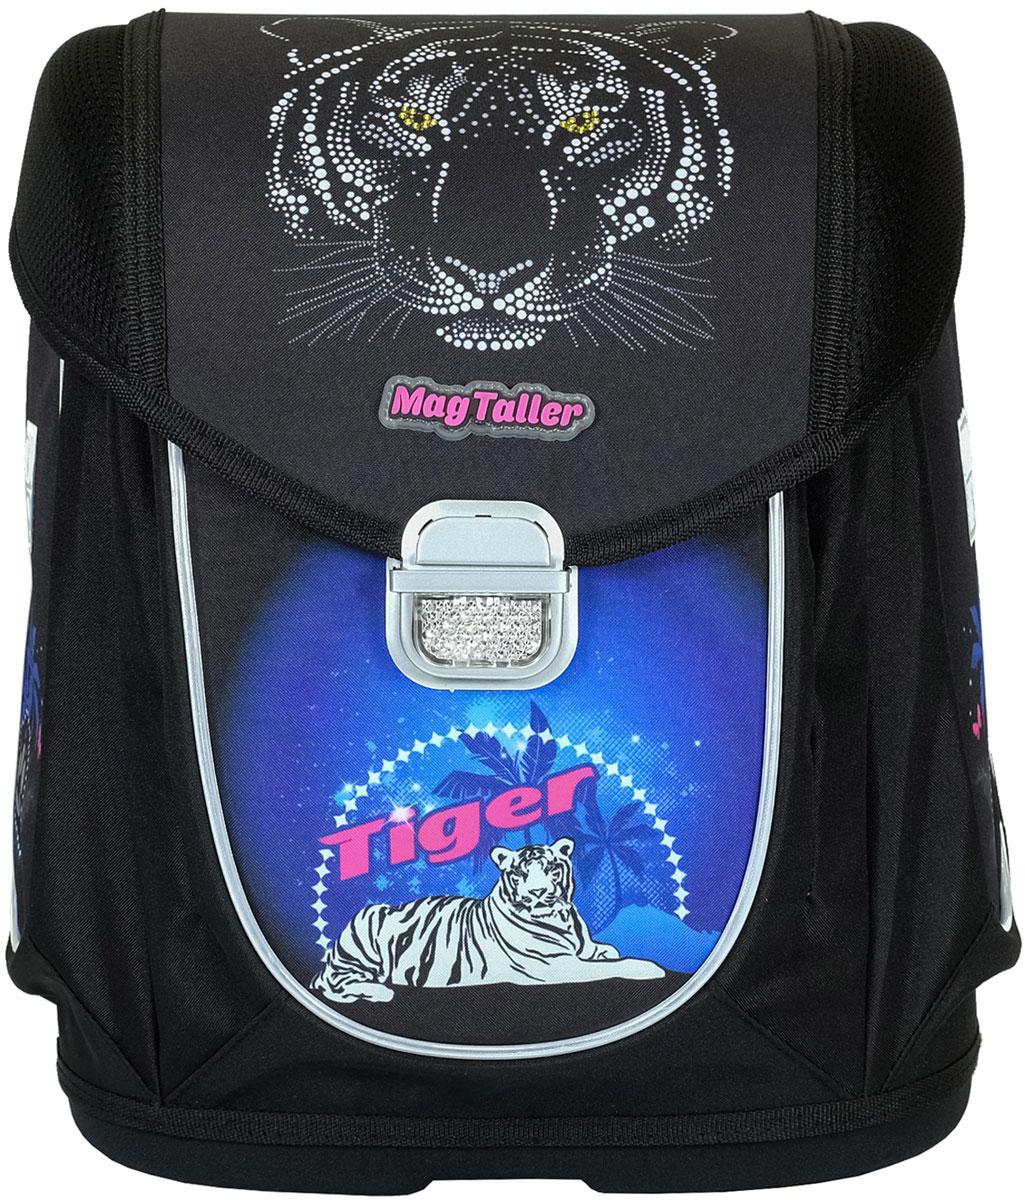 Magtaller Ранец школьный Ezzy III Tiger asics tiger gel lyte iii lc